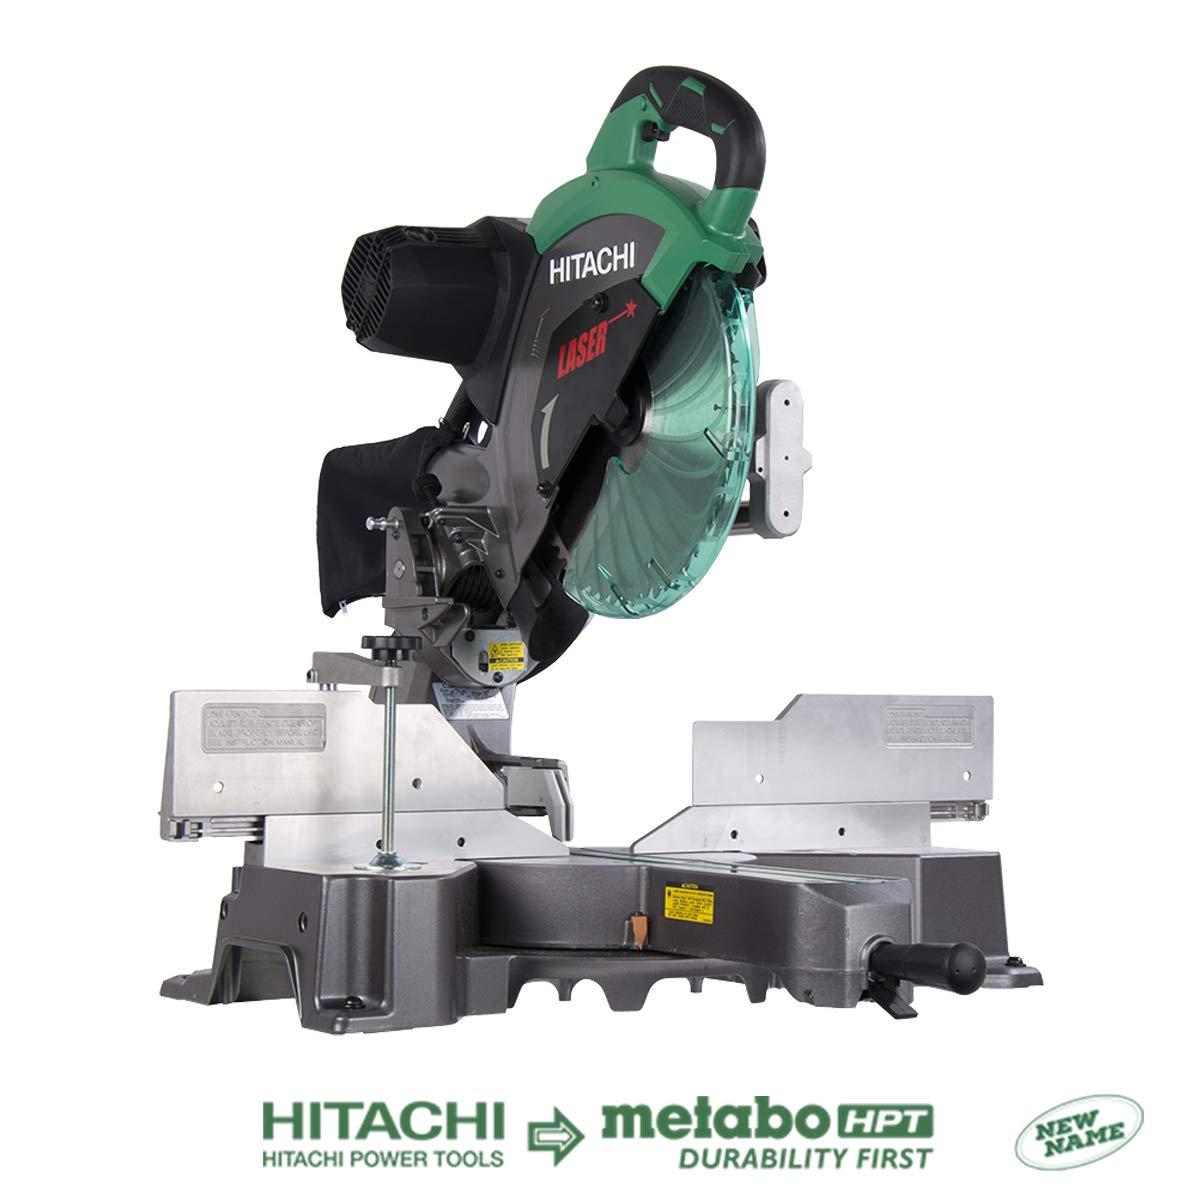 Lowes-B&M-YMMV-Hitachi 12-In 15-Amp Bevel Slide Laser Compound Miter Saw $209